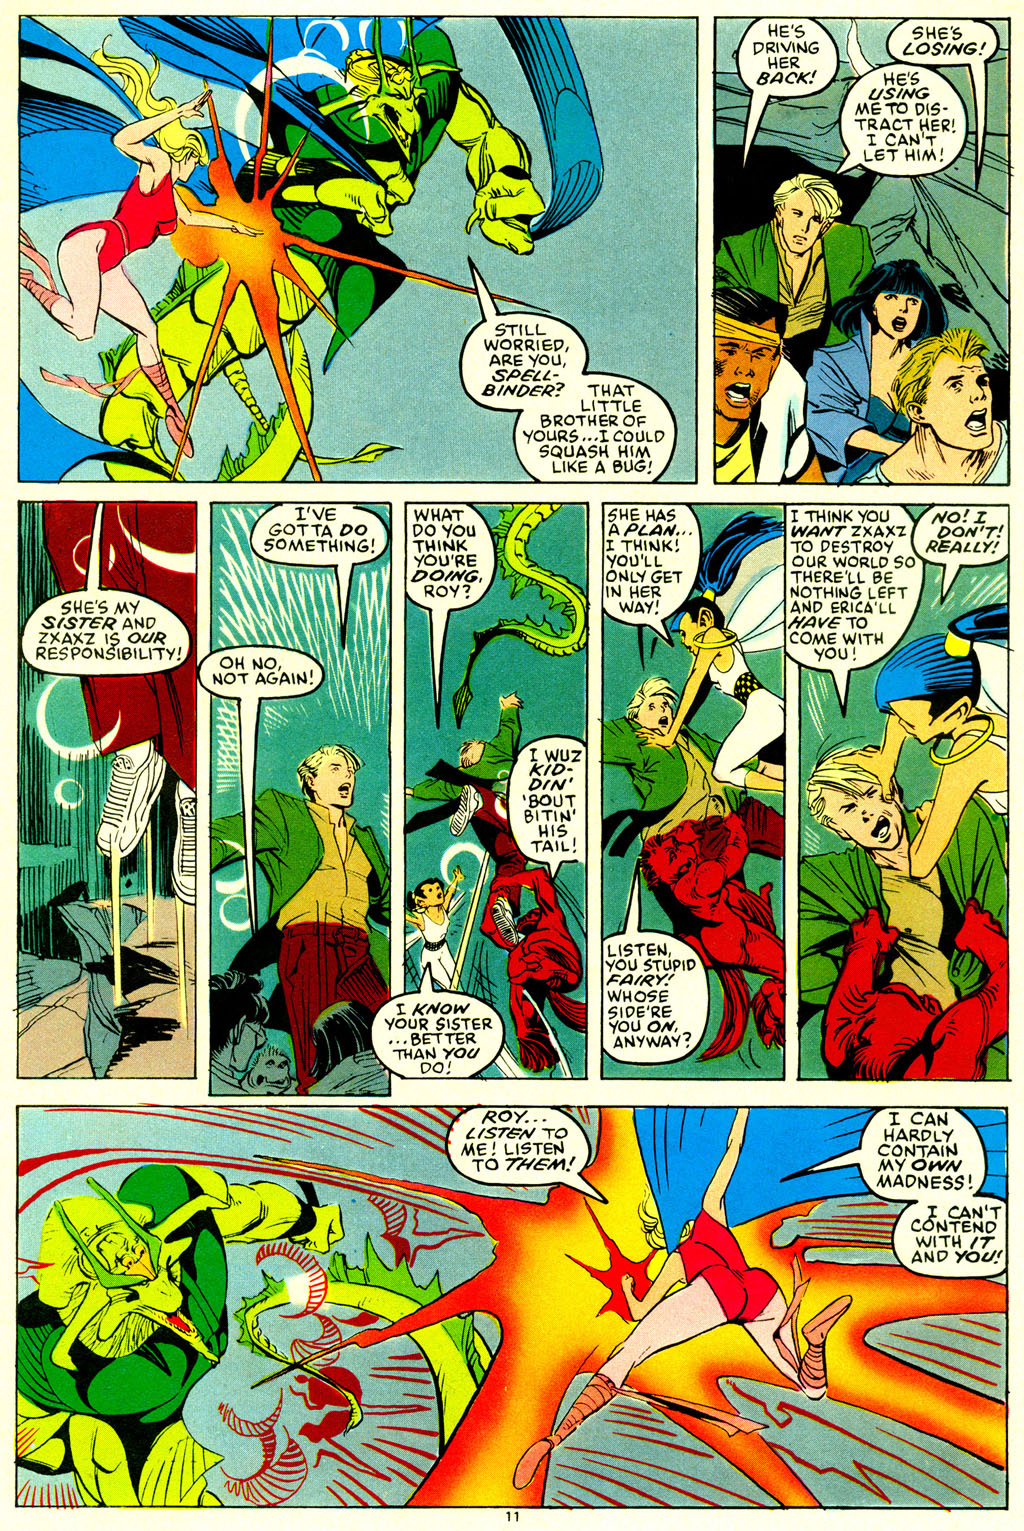 Read online Spellbound comic -  Issue #6 - 12